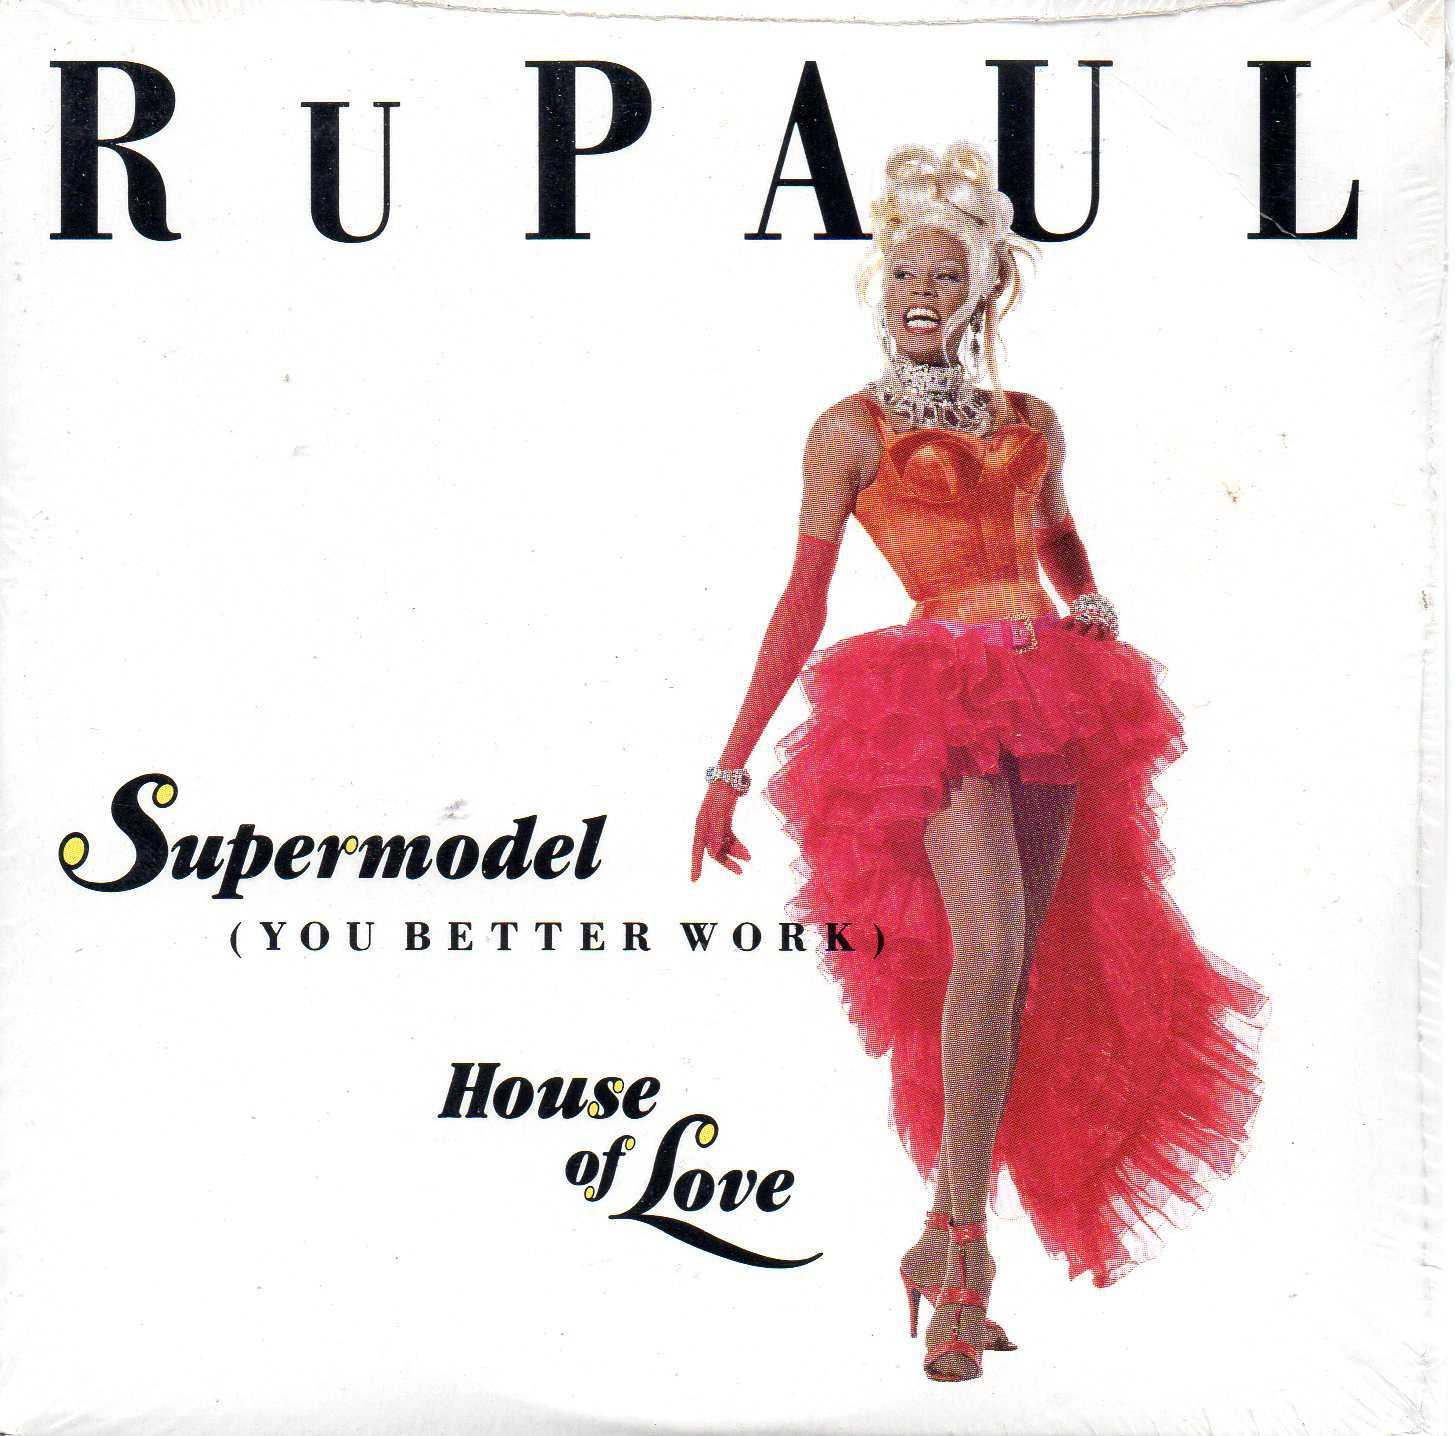 Rupaul Supermodel